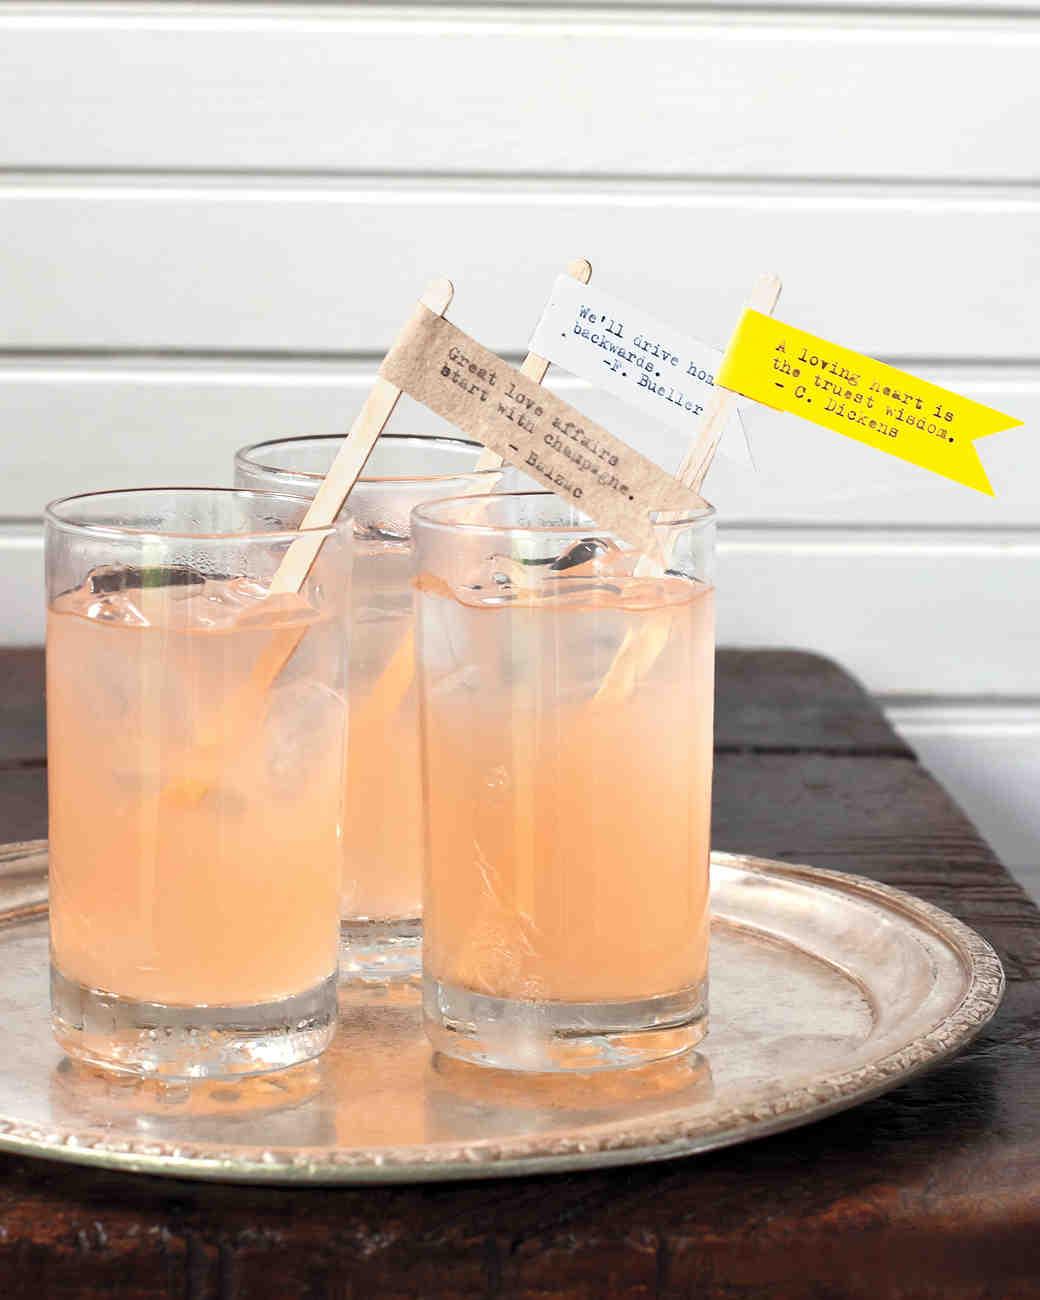 drinks-0811mwd106246.jpg